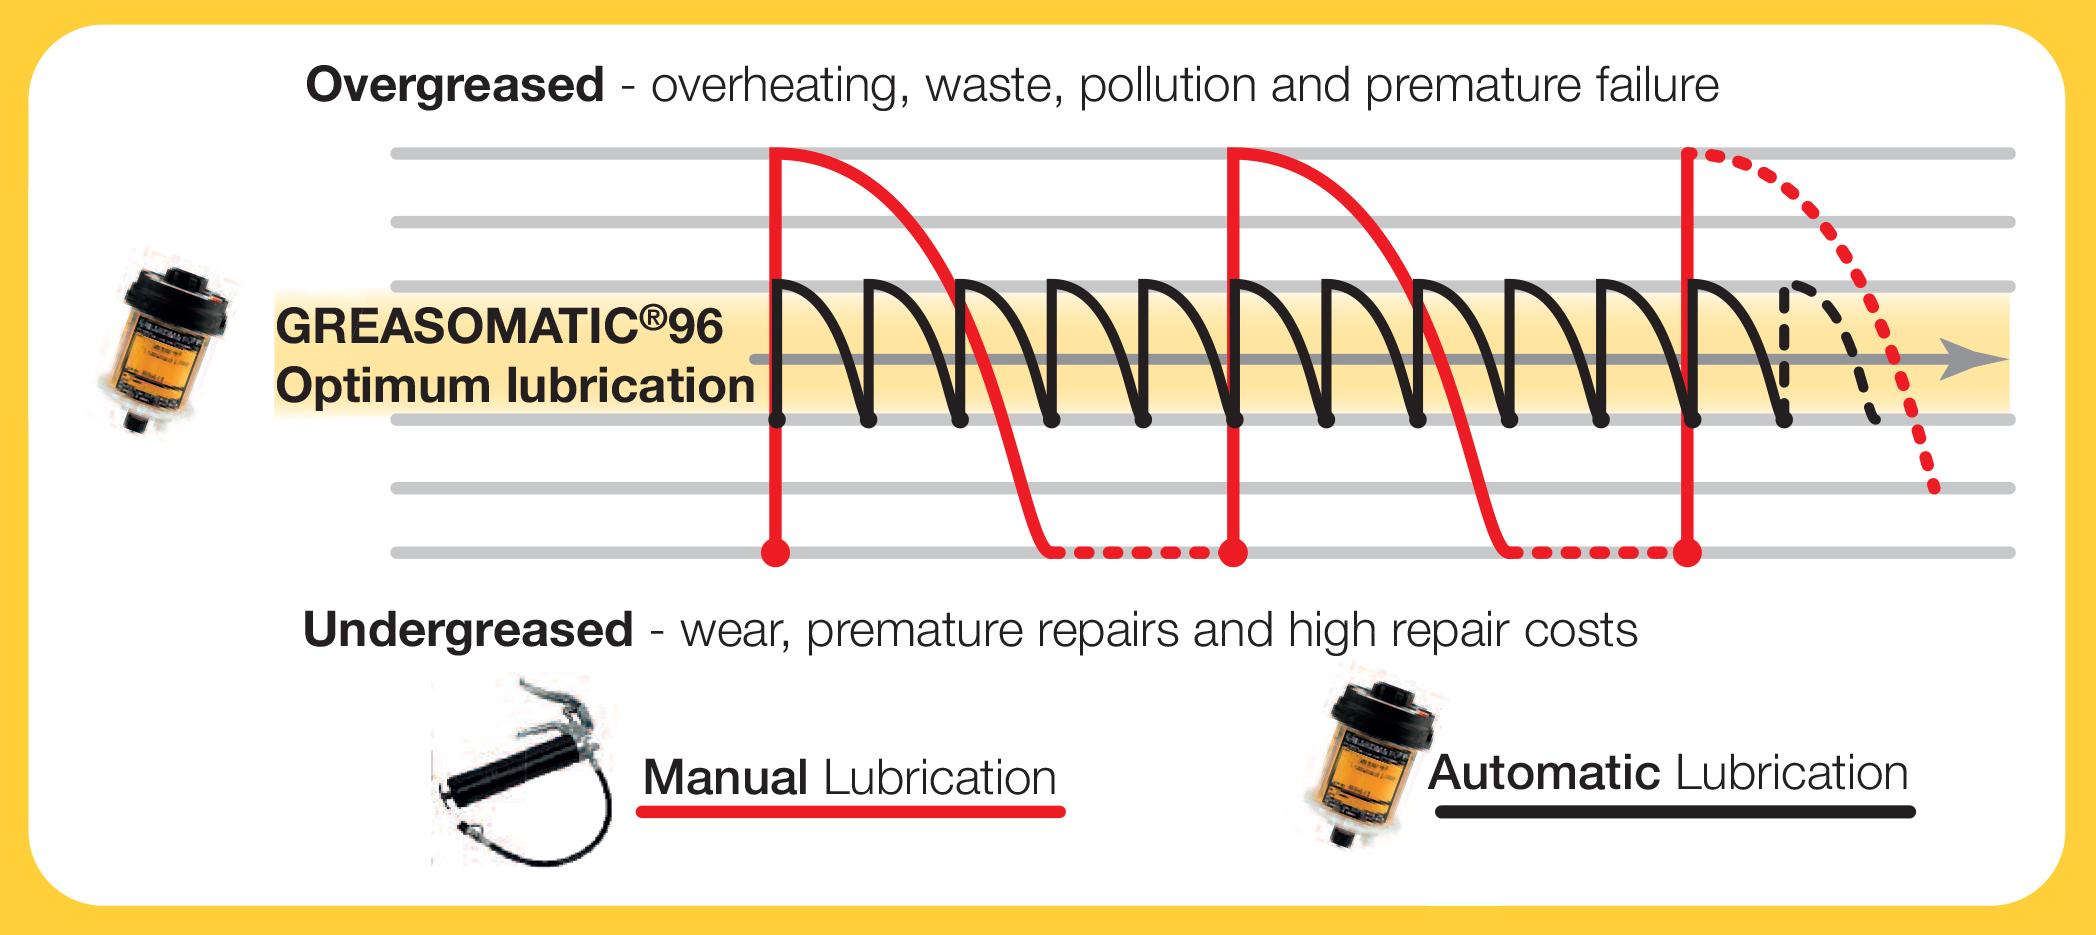 Greasomatics & Lubricants | Wymark